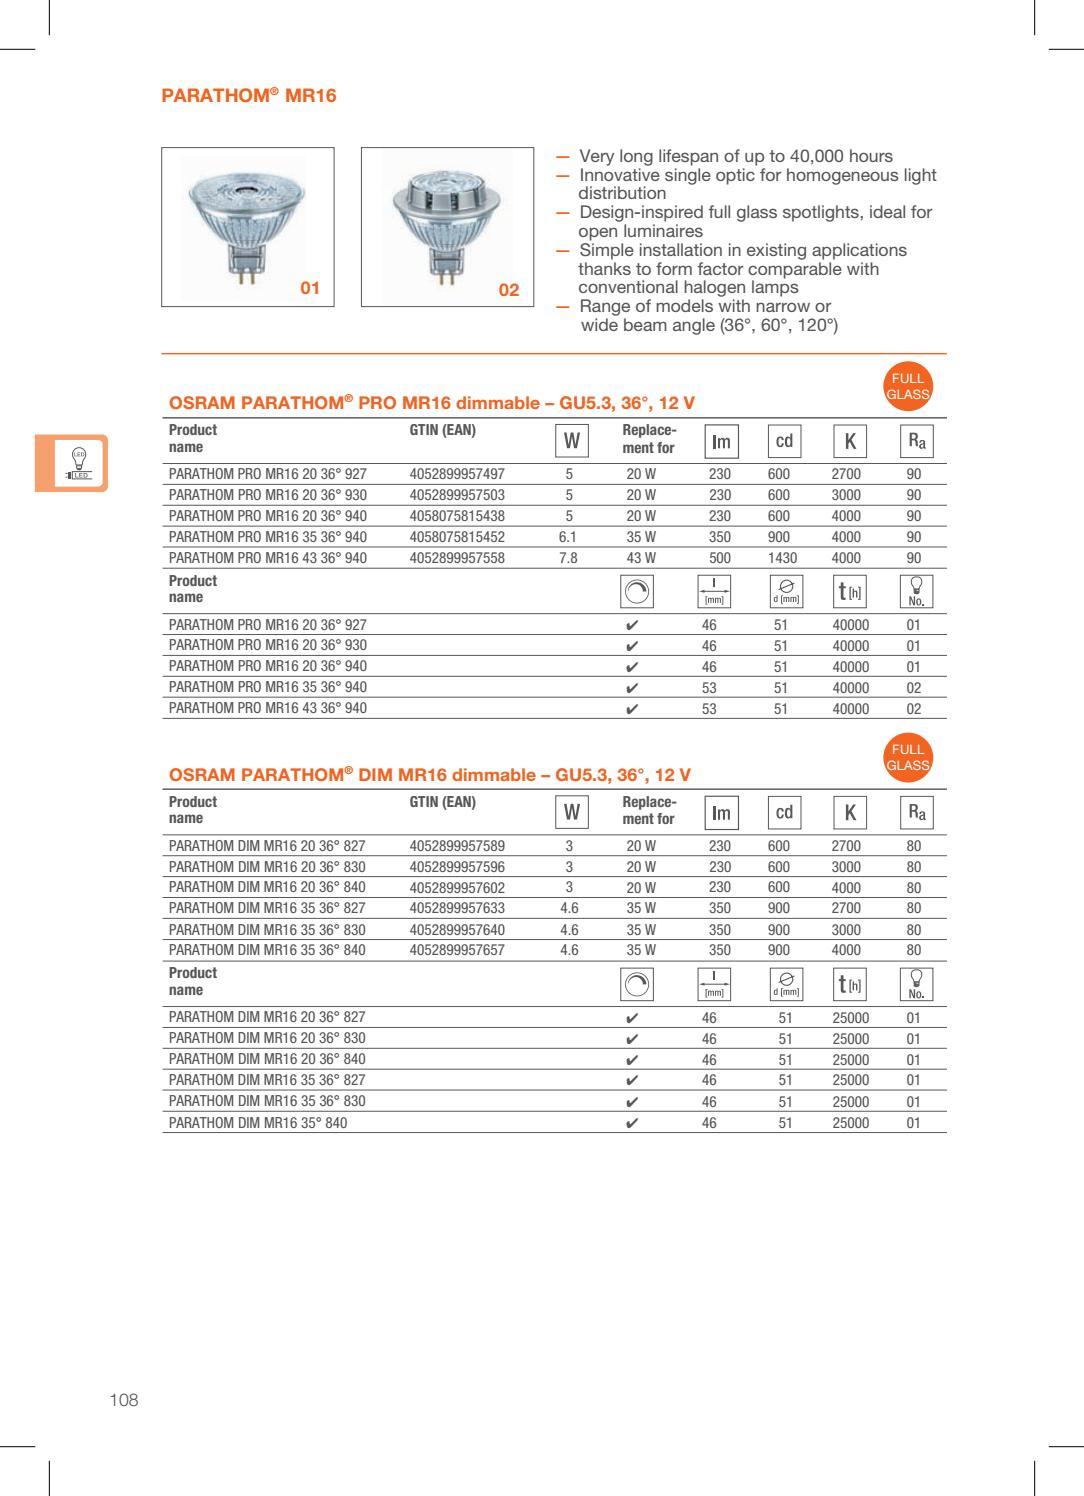 165 W, Sony, AW10, AW10S, AW15, AW15KT, AW15S, VPL-AW10, VPL-AW10S, VPL-AW15, VPL-AW15KT, VPL-AW15S L/ámpara para proyector Osram ECL-5397-BO 165W l/ámpara de proyecci/ón